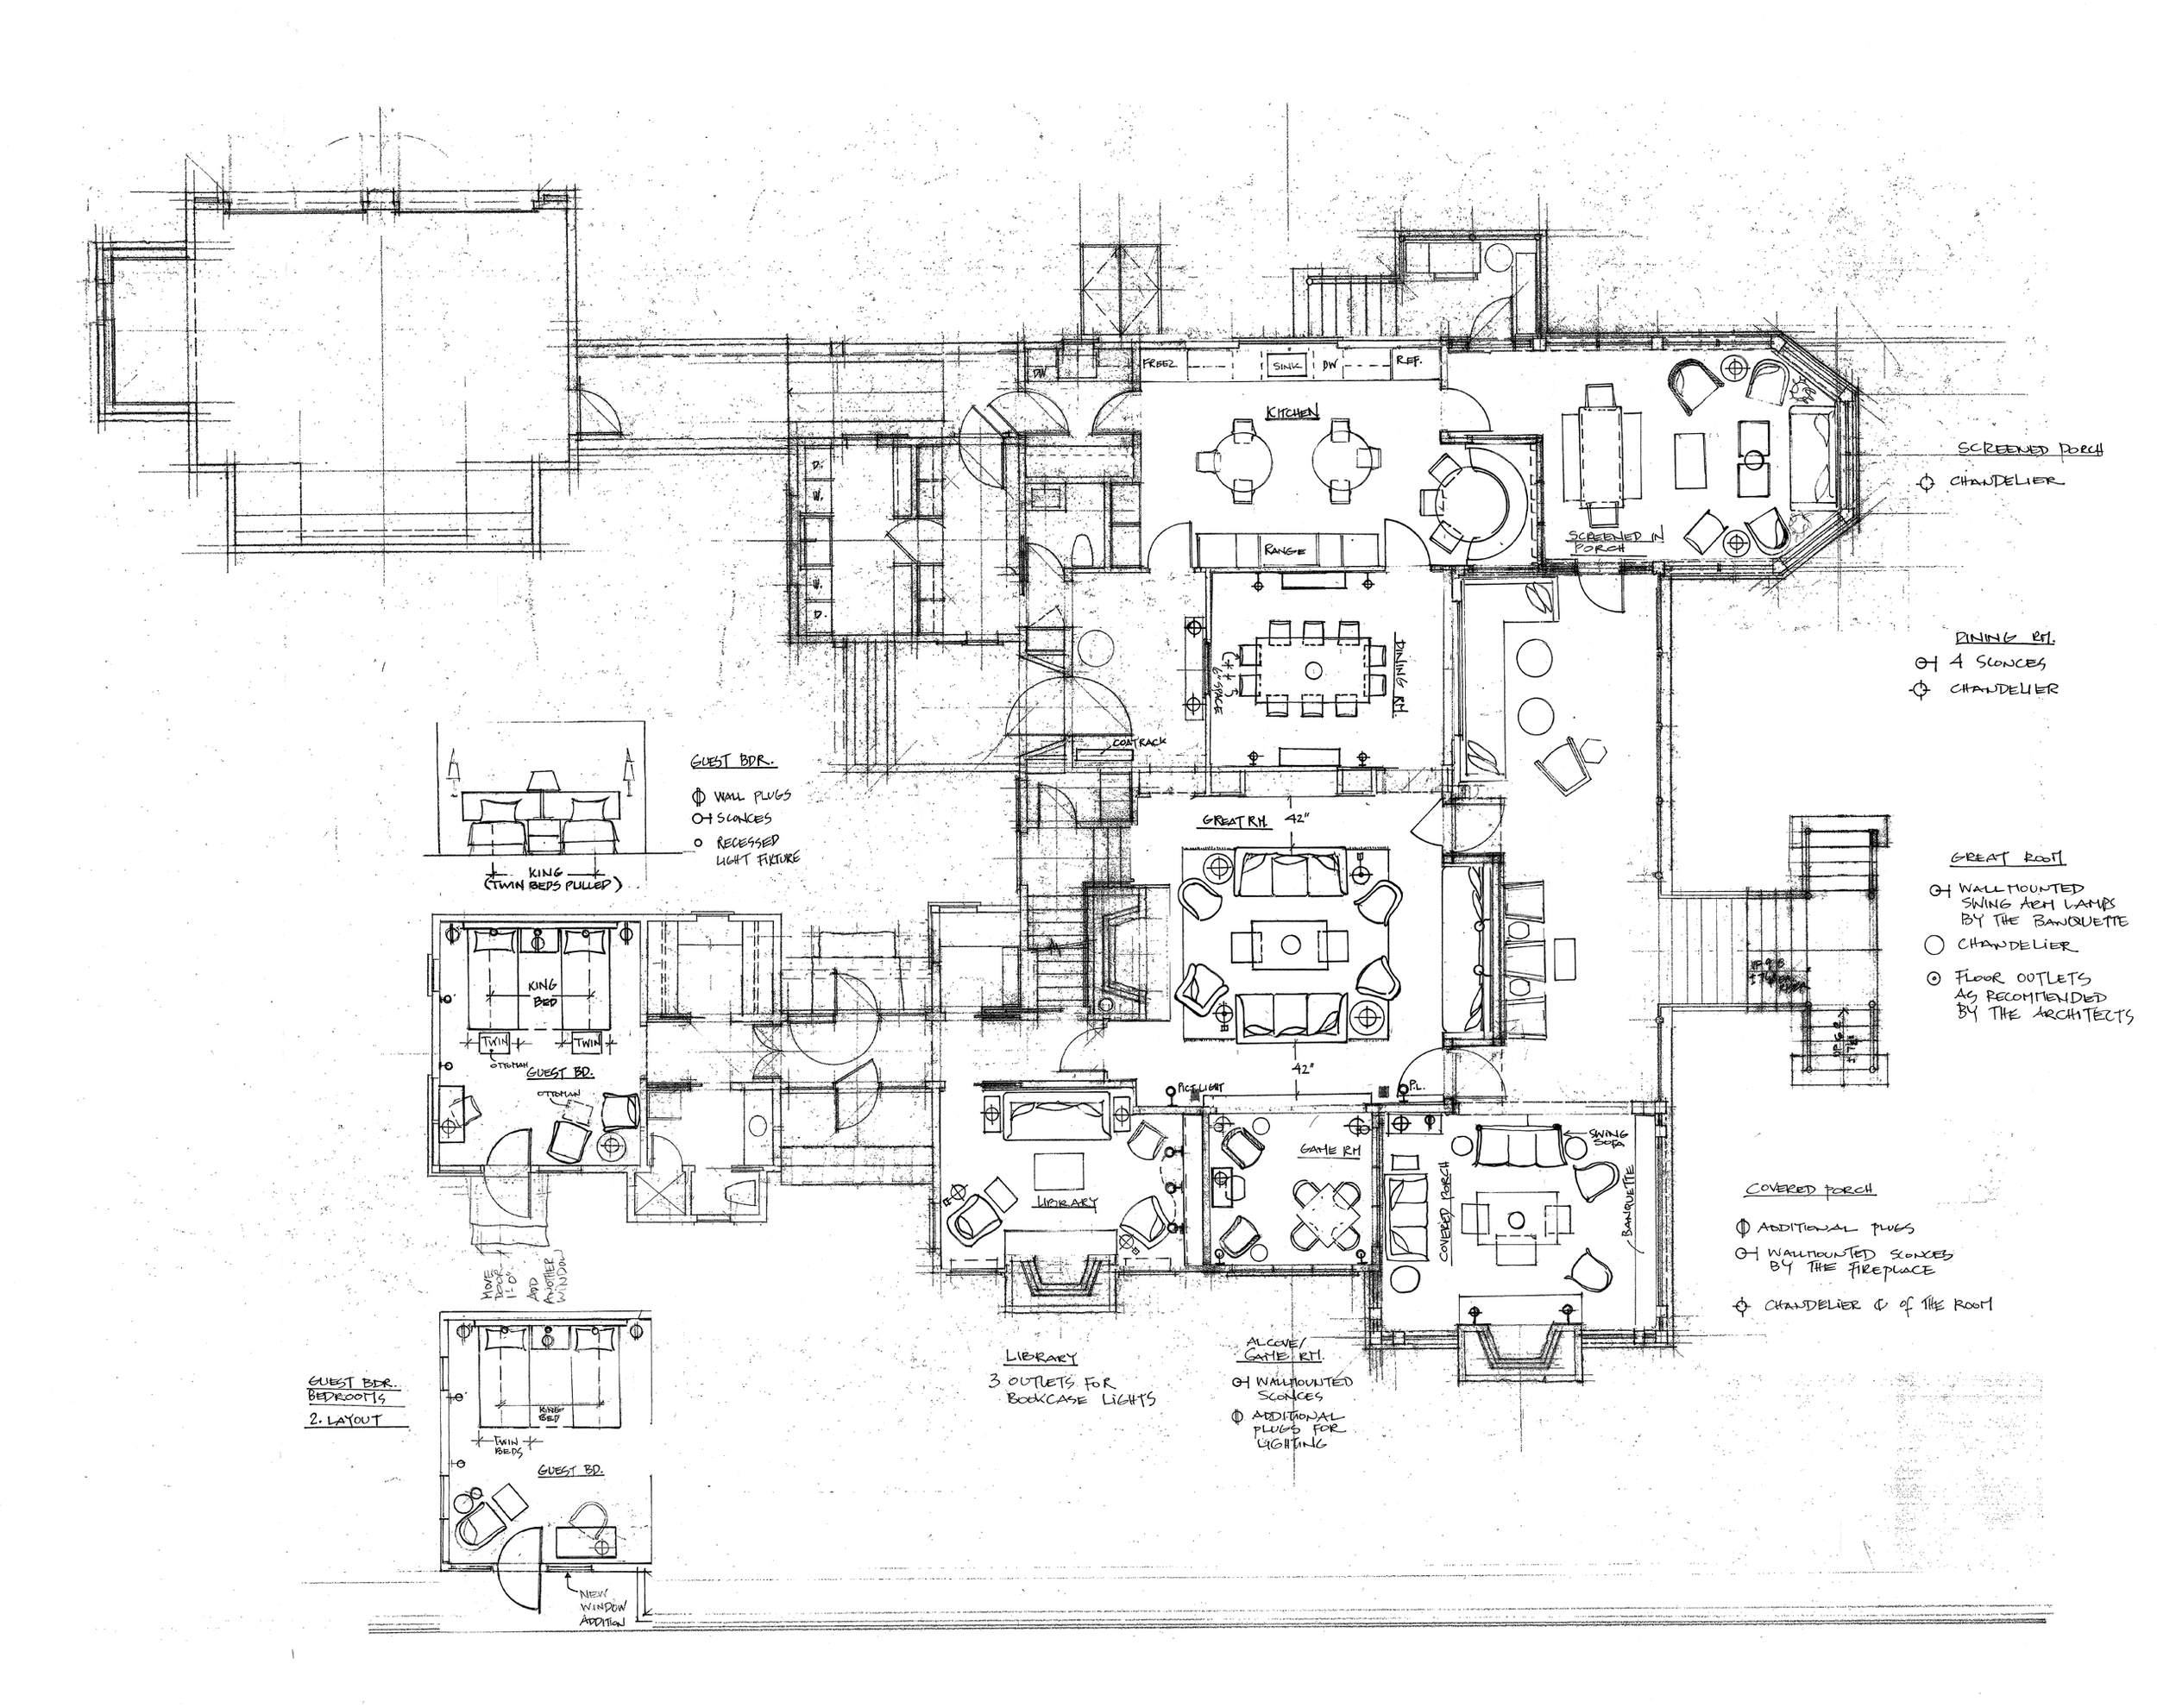 Lake_Placid.New_York.Lake_House.Robert_Orr_&_Associates.Architecture.Landscape_Architecture.Urbanism.Camp.Plan.Barnes.jpg